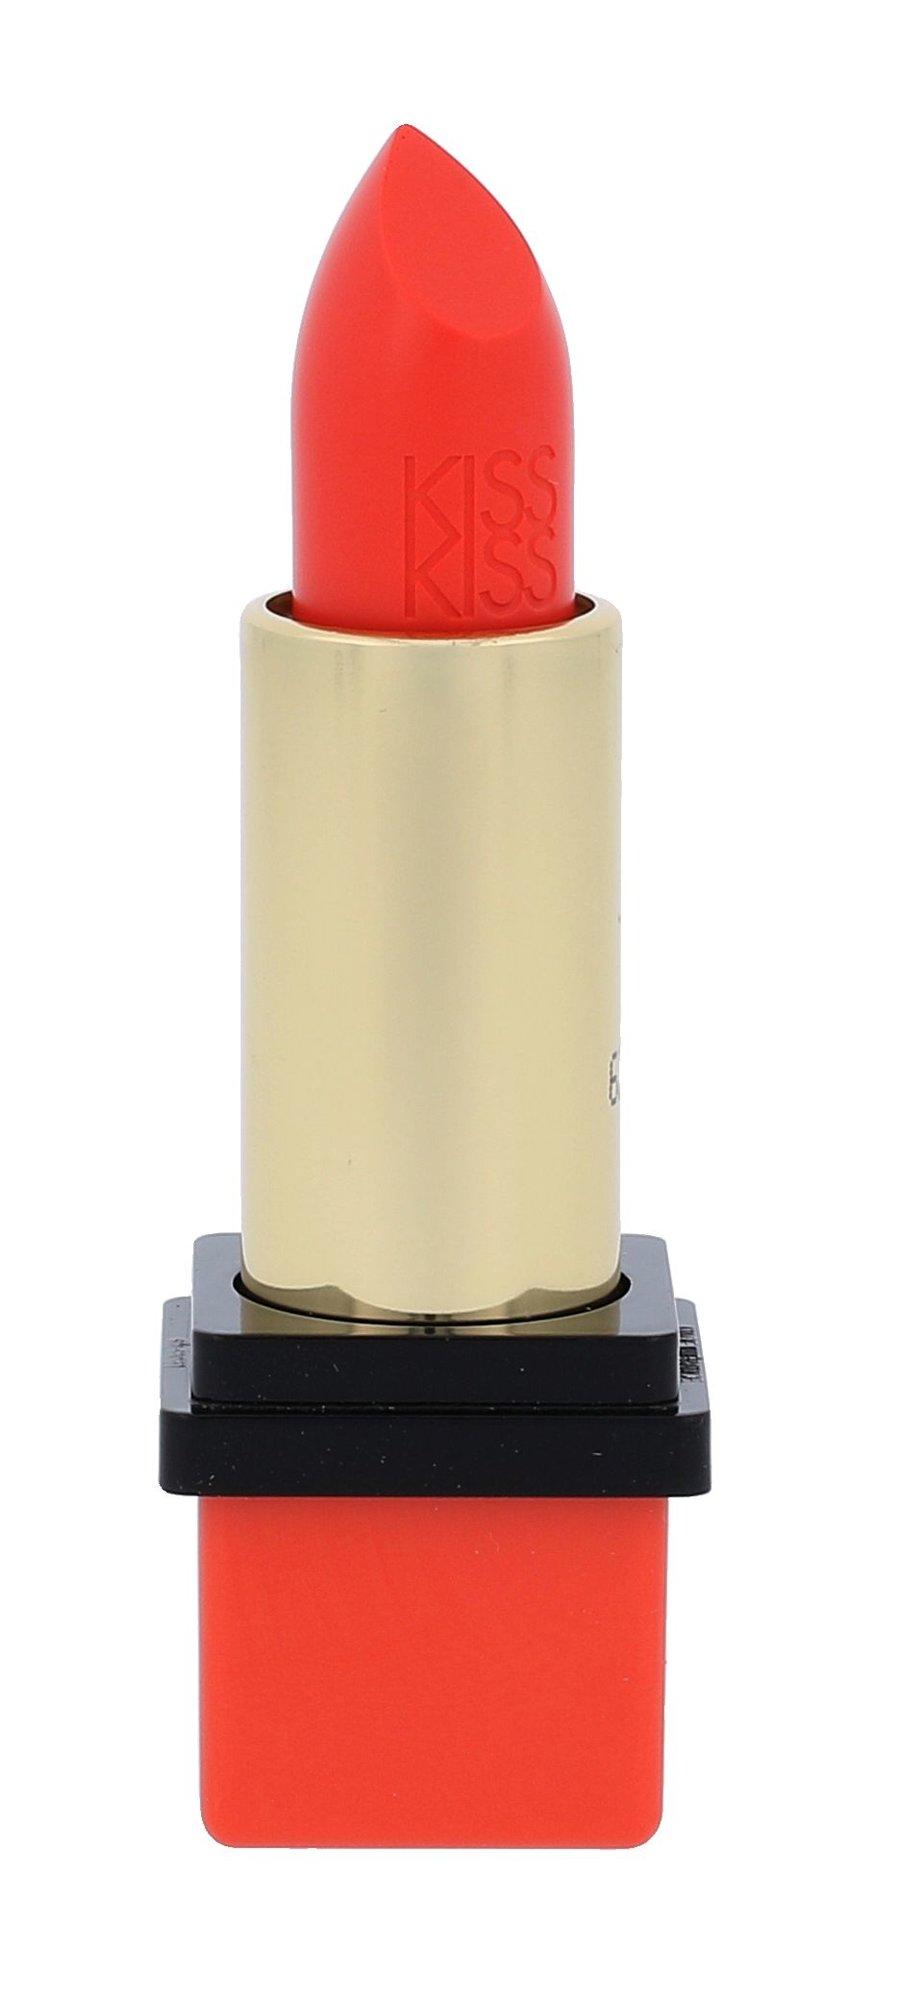 Guerlain KissKiss Cosmetic 3,5ml 542 Orange Peps